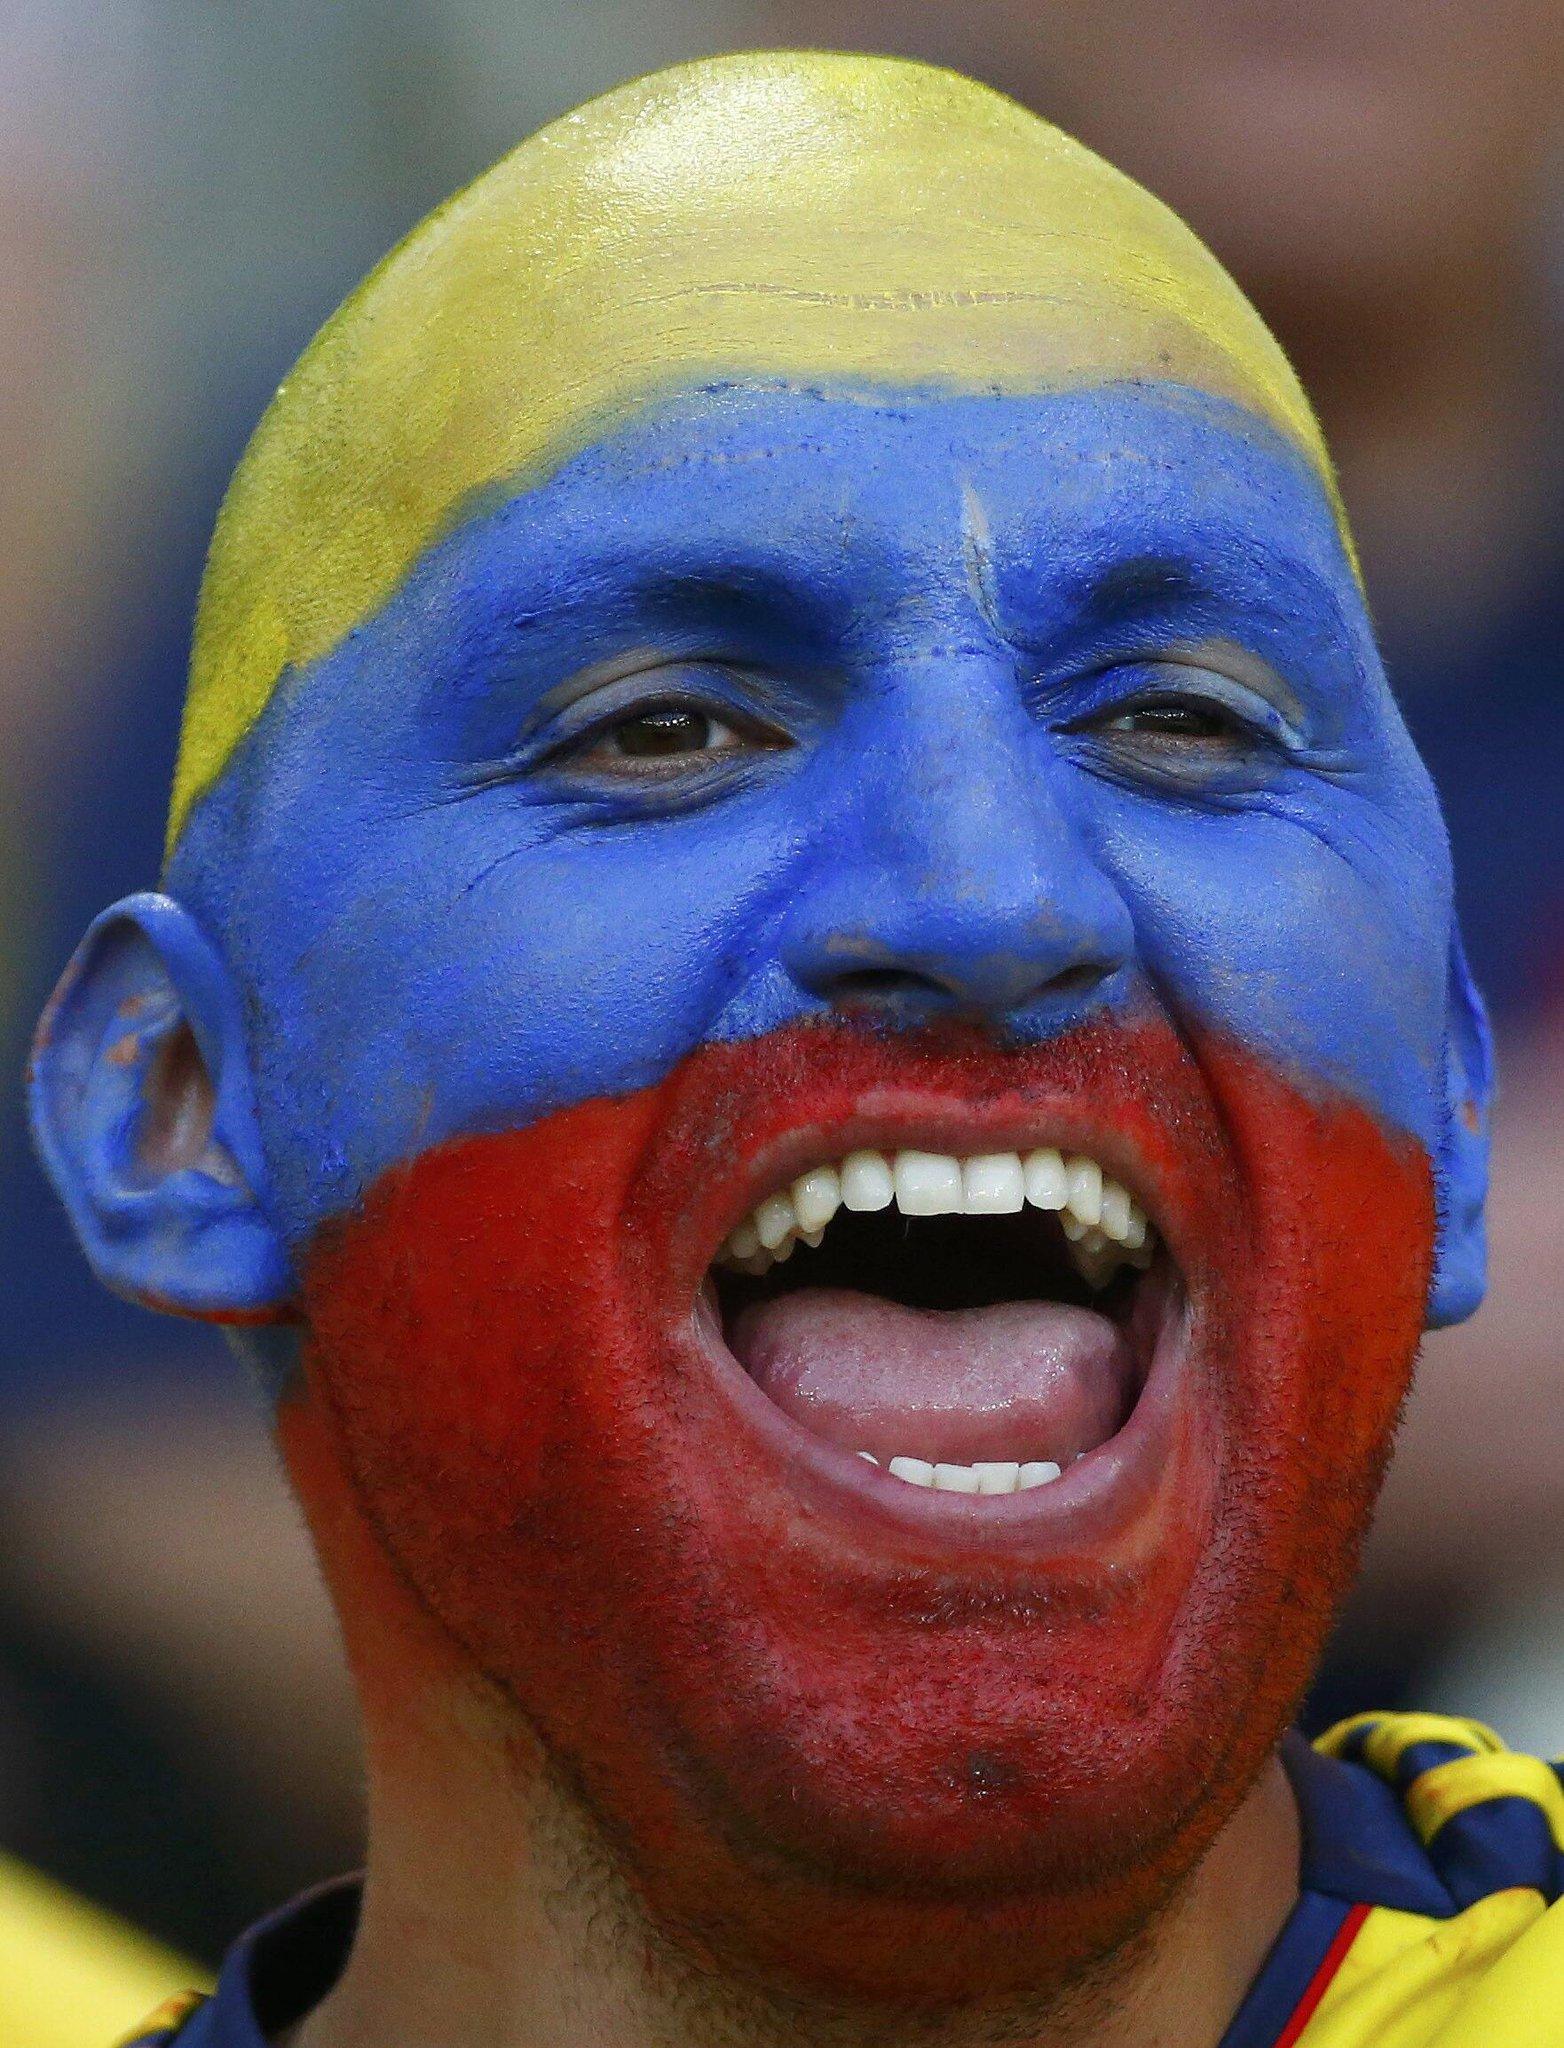 RT @futbolred: ¡¡Estamos en Maracaná!! Vamos a hacer historia...#VamosColombia !!!!! http://t.co/KVyXiCJcpM